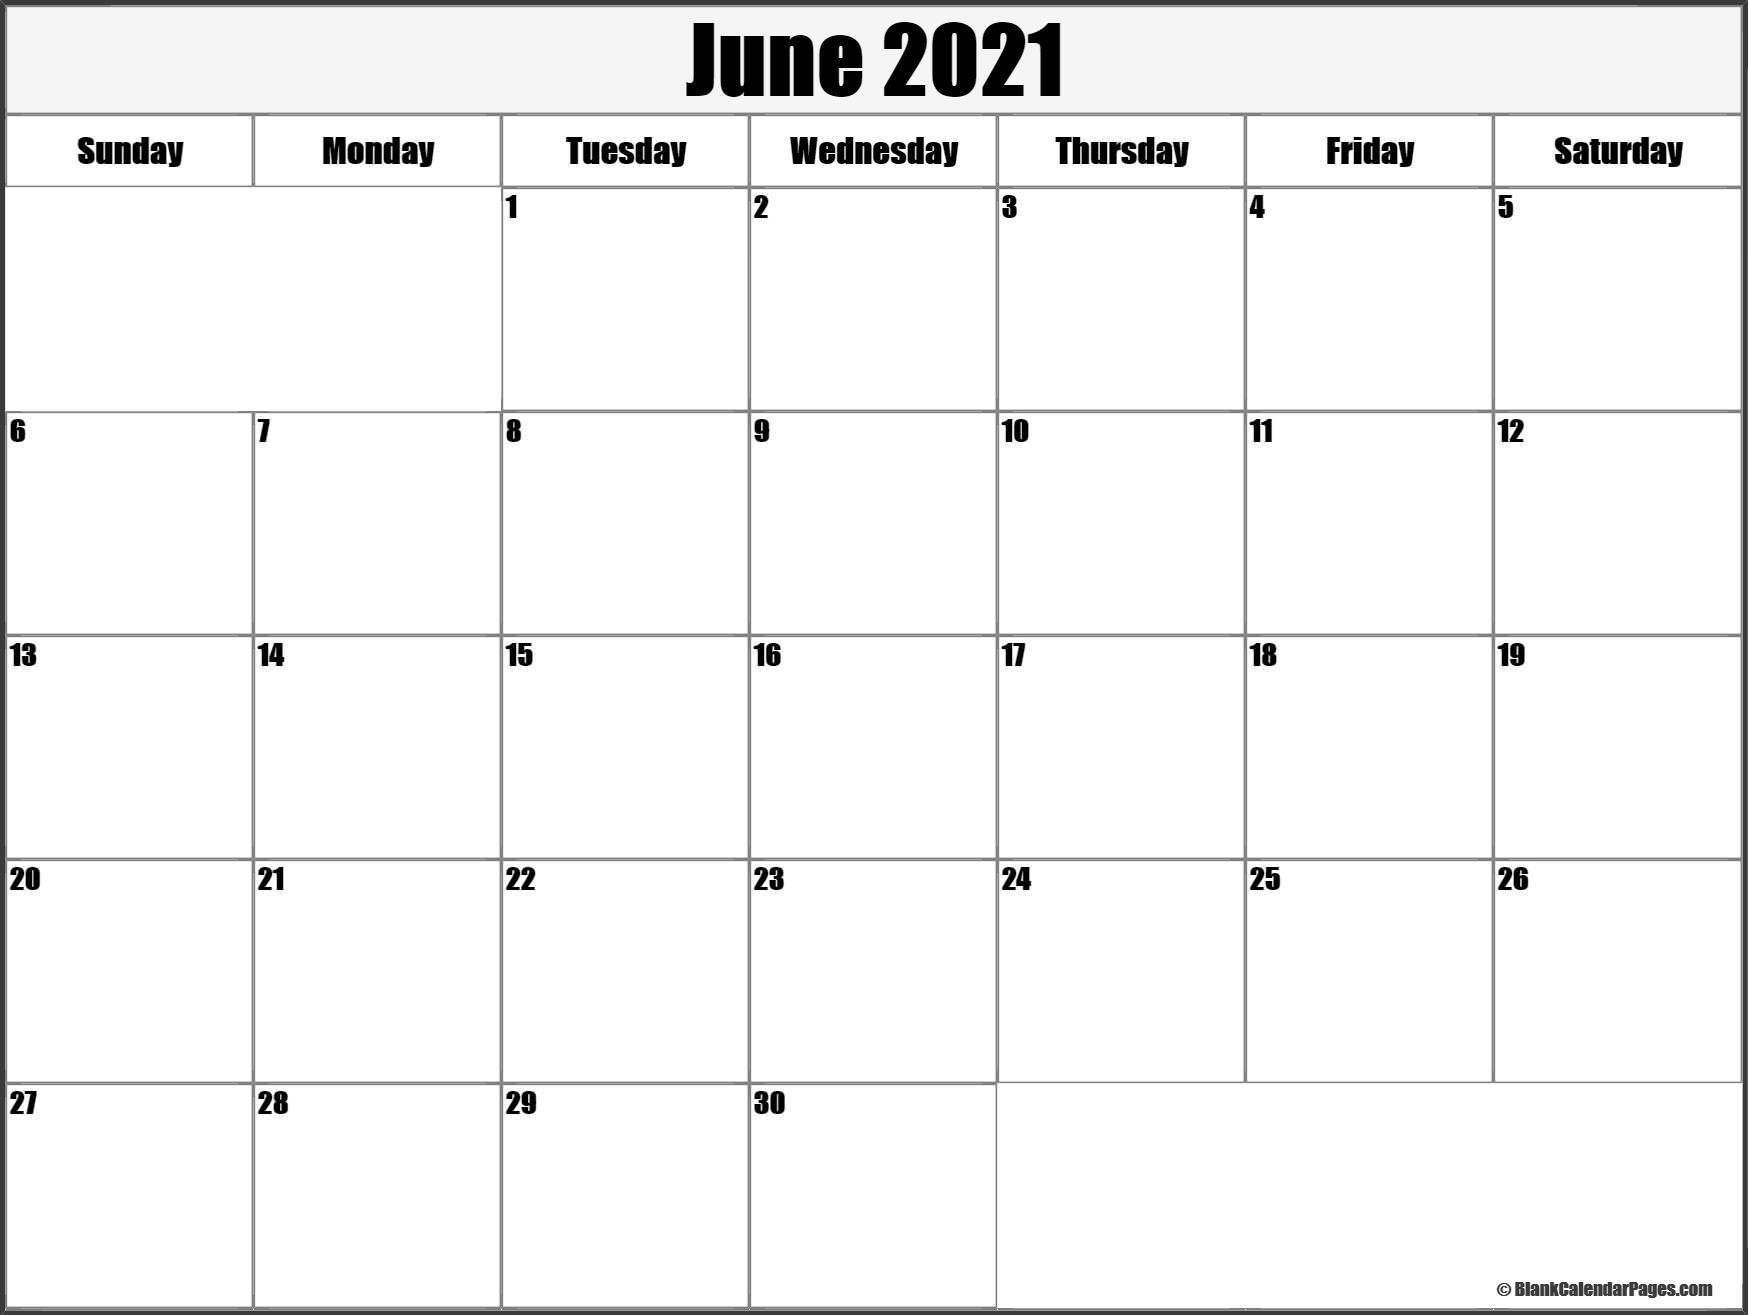 June 2021 Blank Calendar Templates